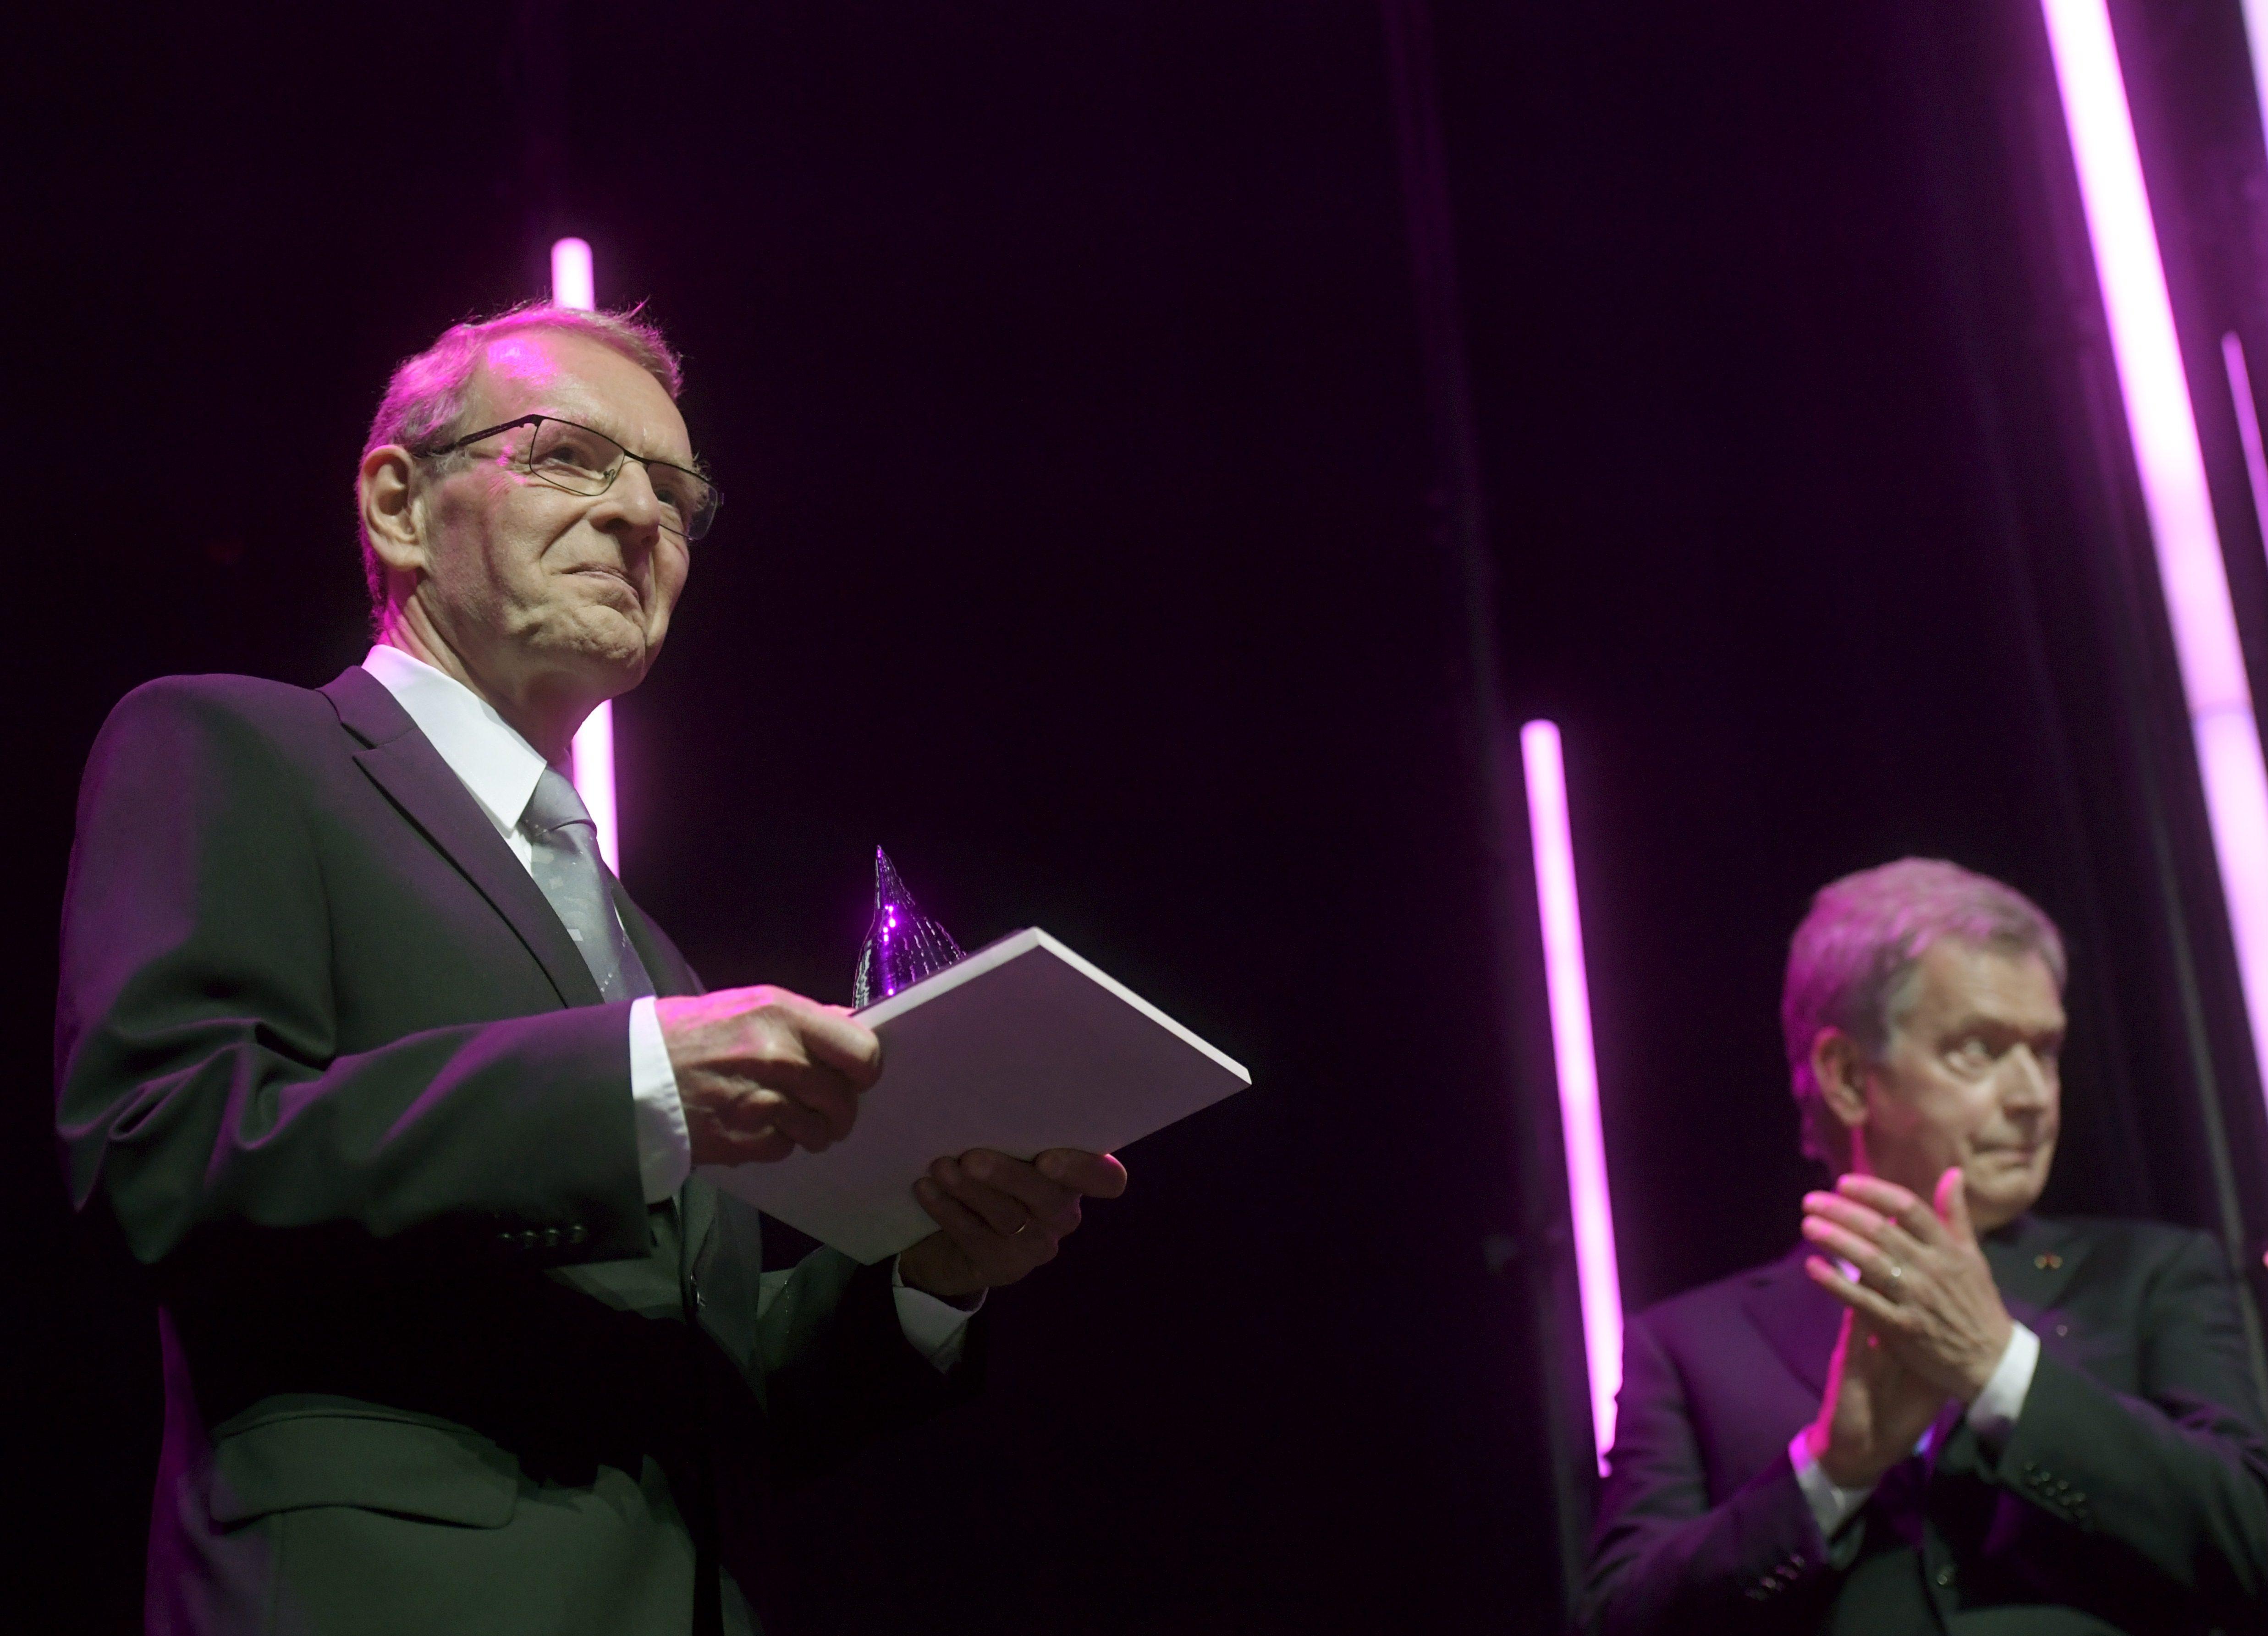 Tuomo Suntola (izquierda) recibiendo el premio | Lehtikuva | Vesa Moilanen | Finland Out | Agence France-Presse